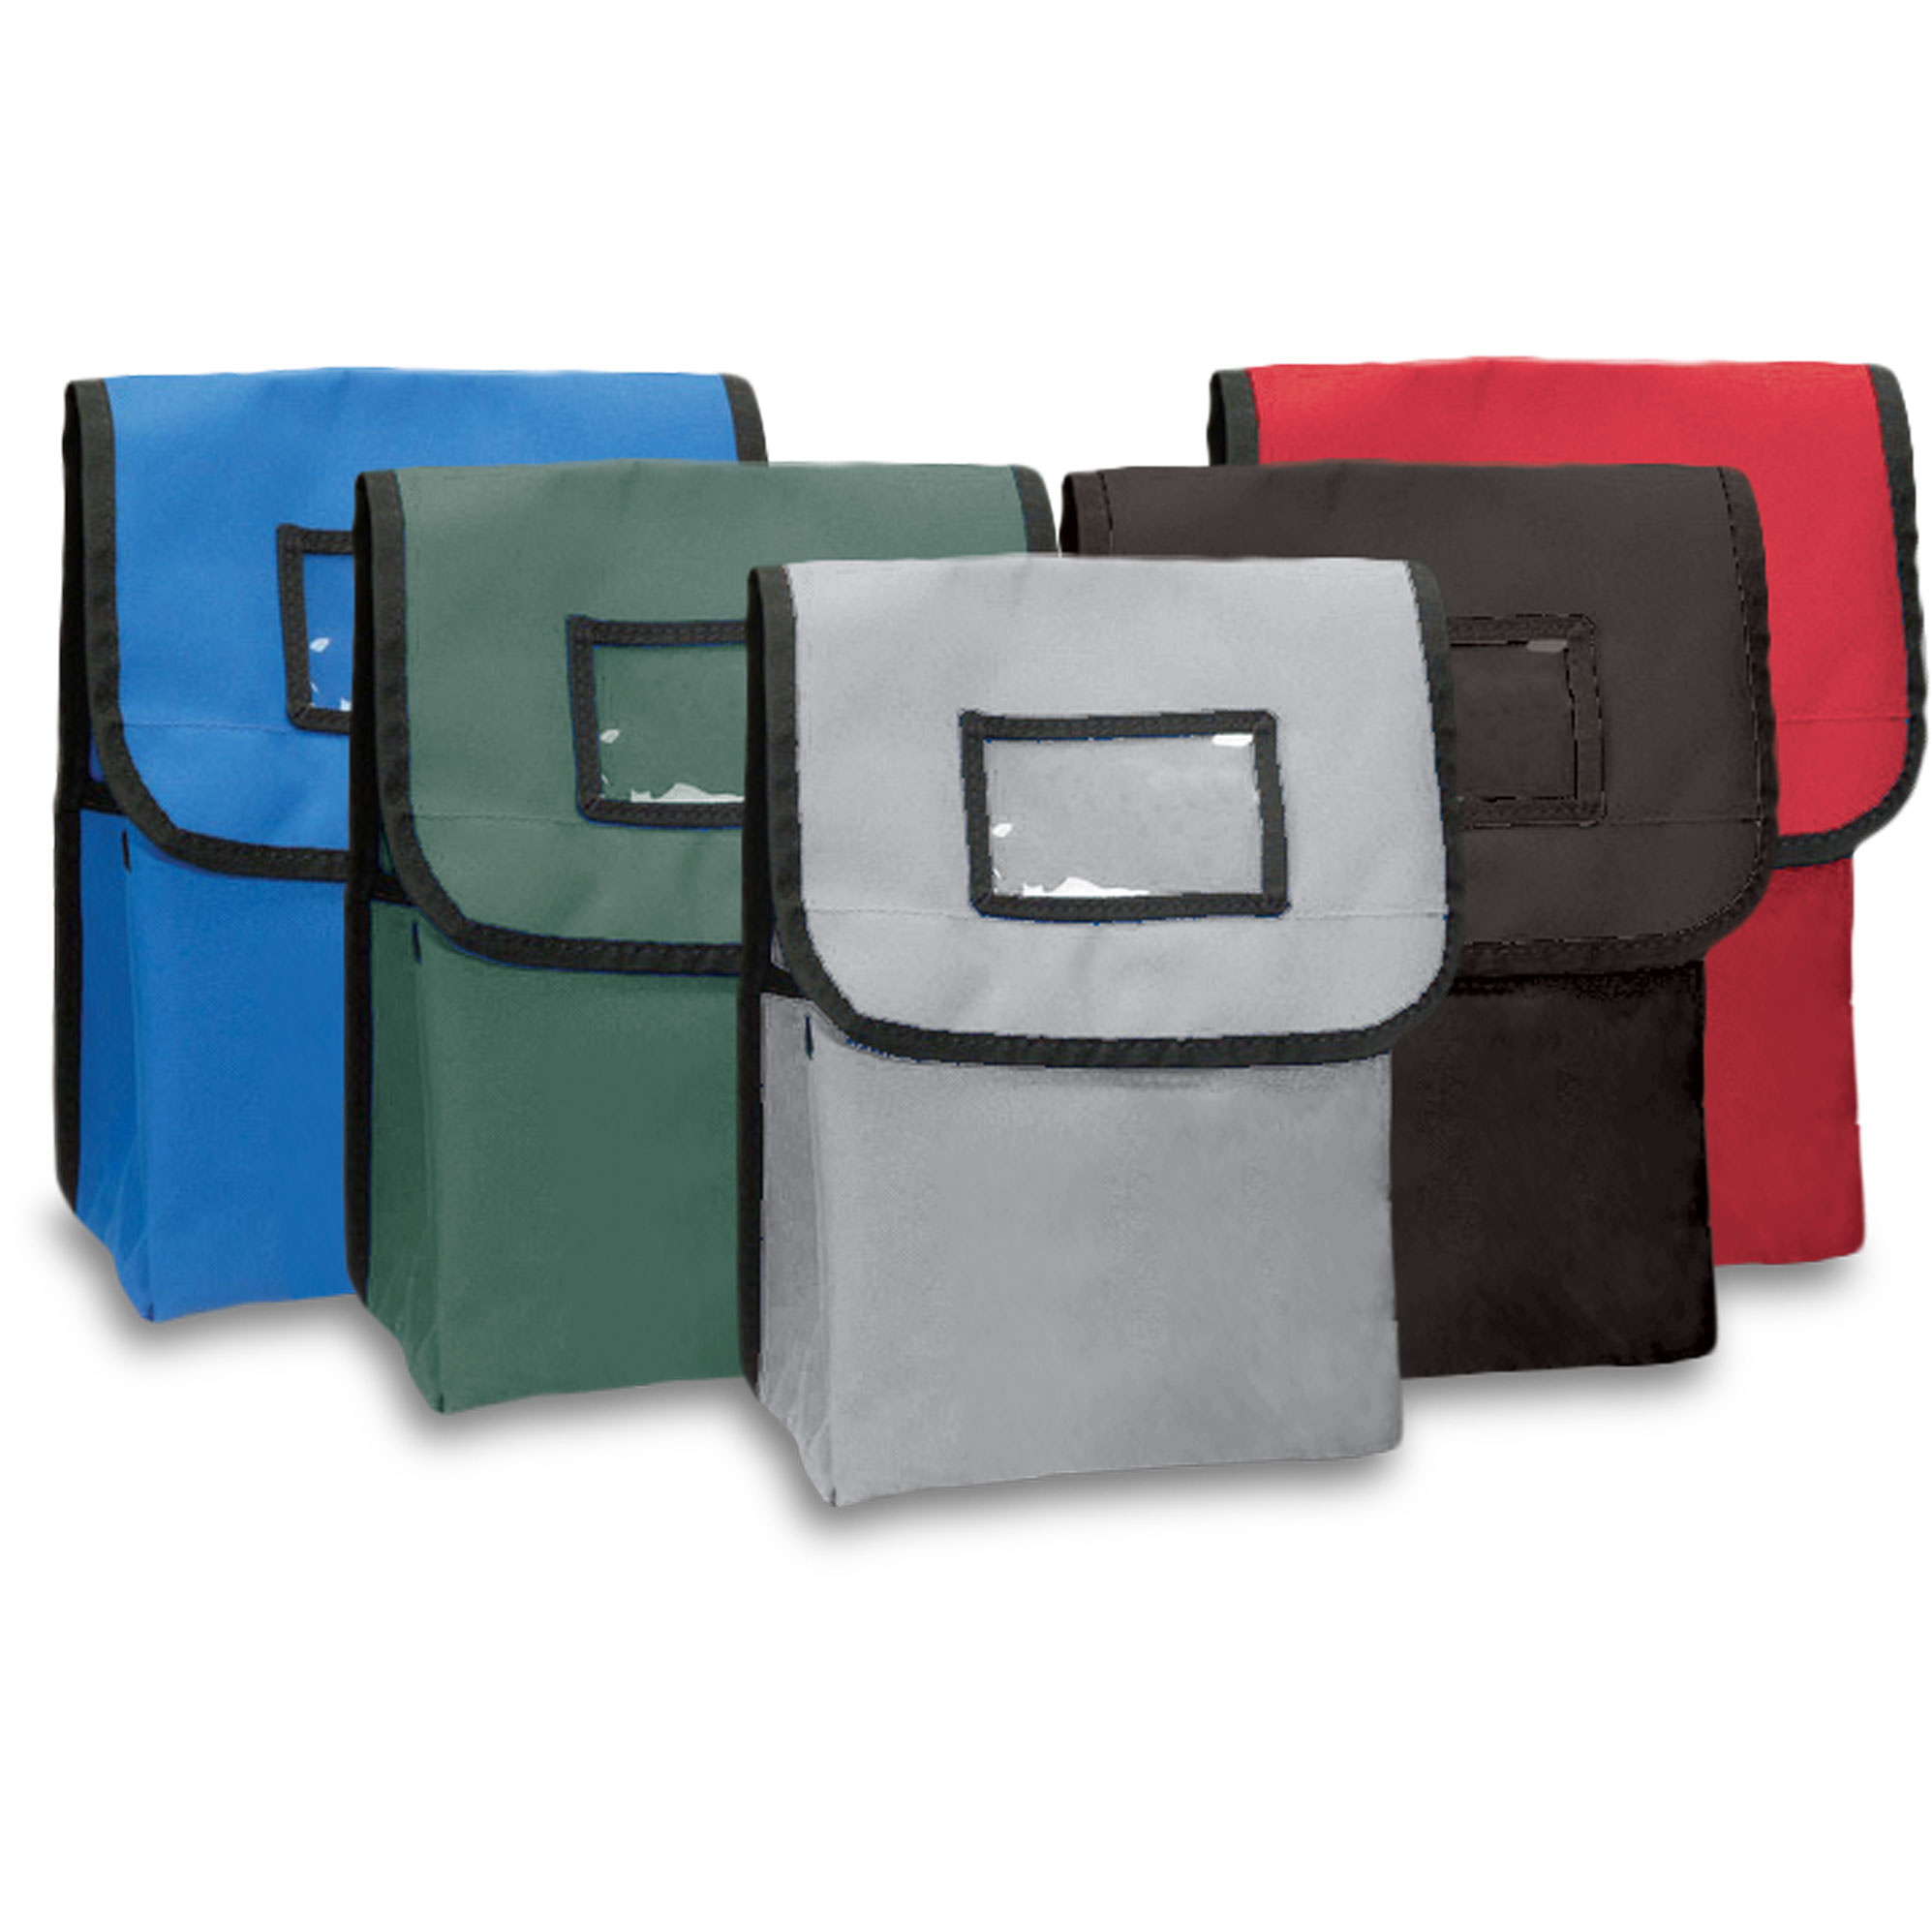 Full Face Respirator Bag-2W International